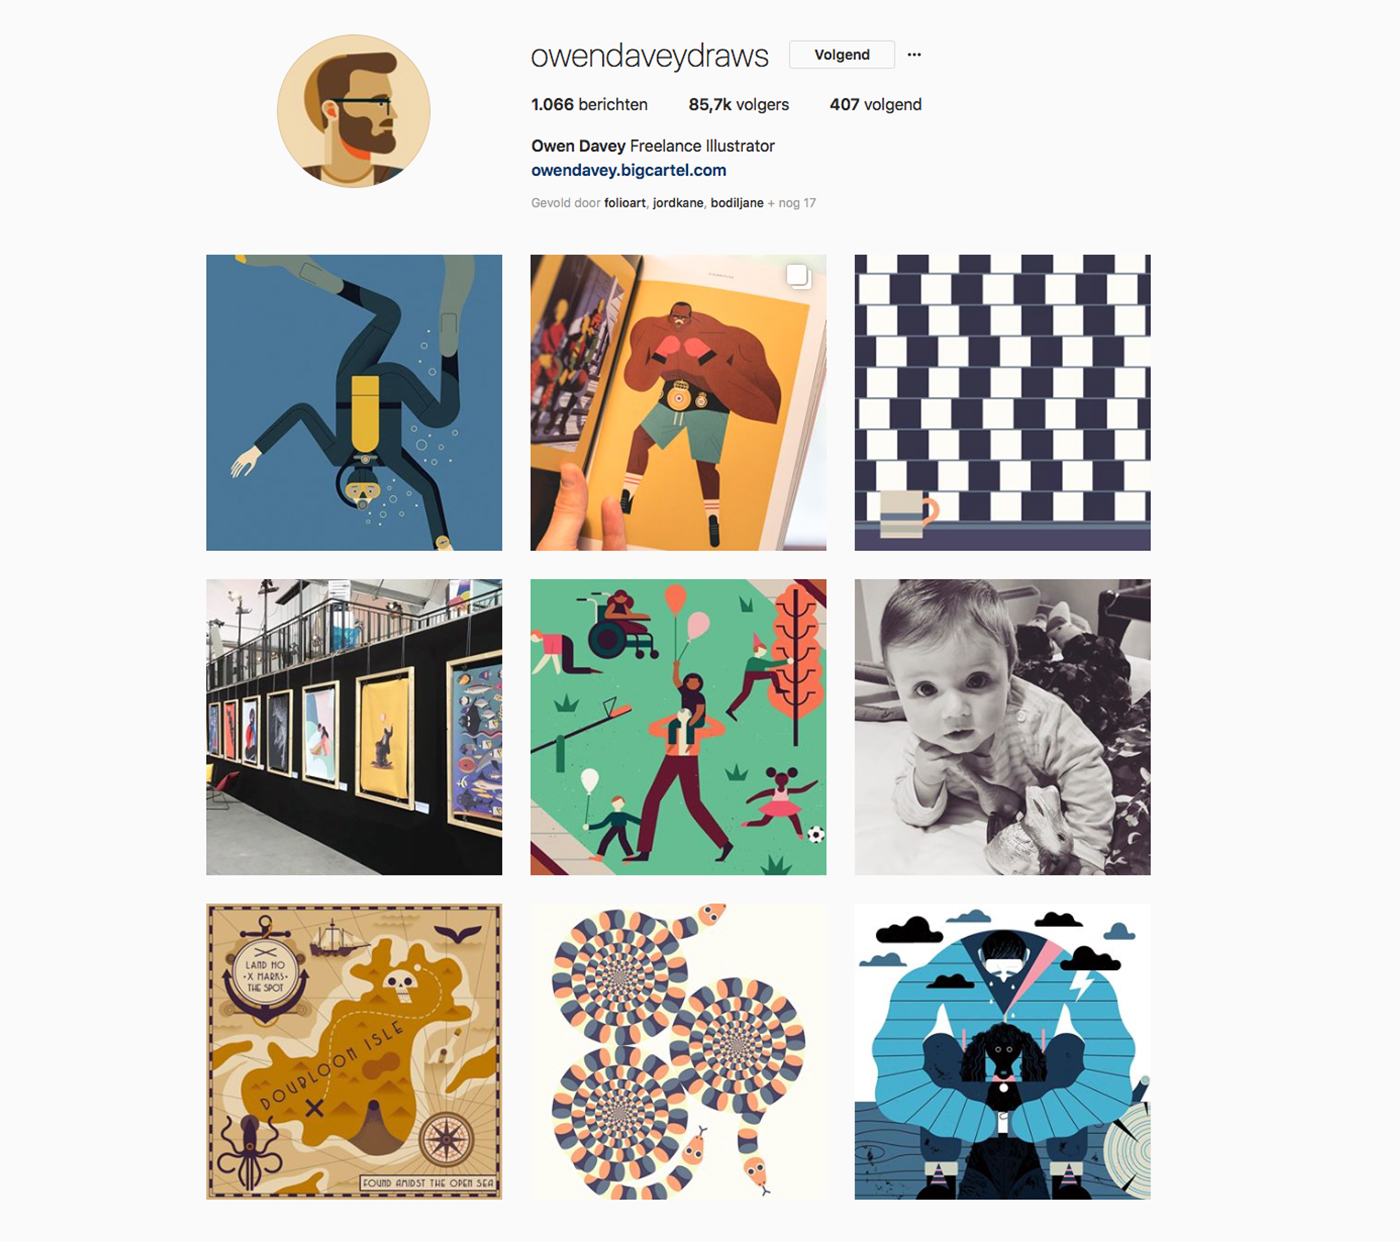 Instagram account of Owen Davey